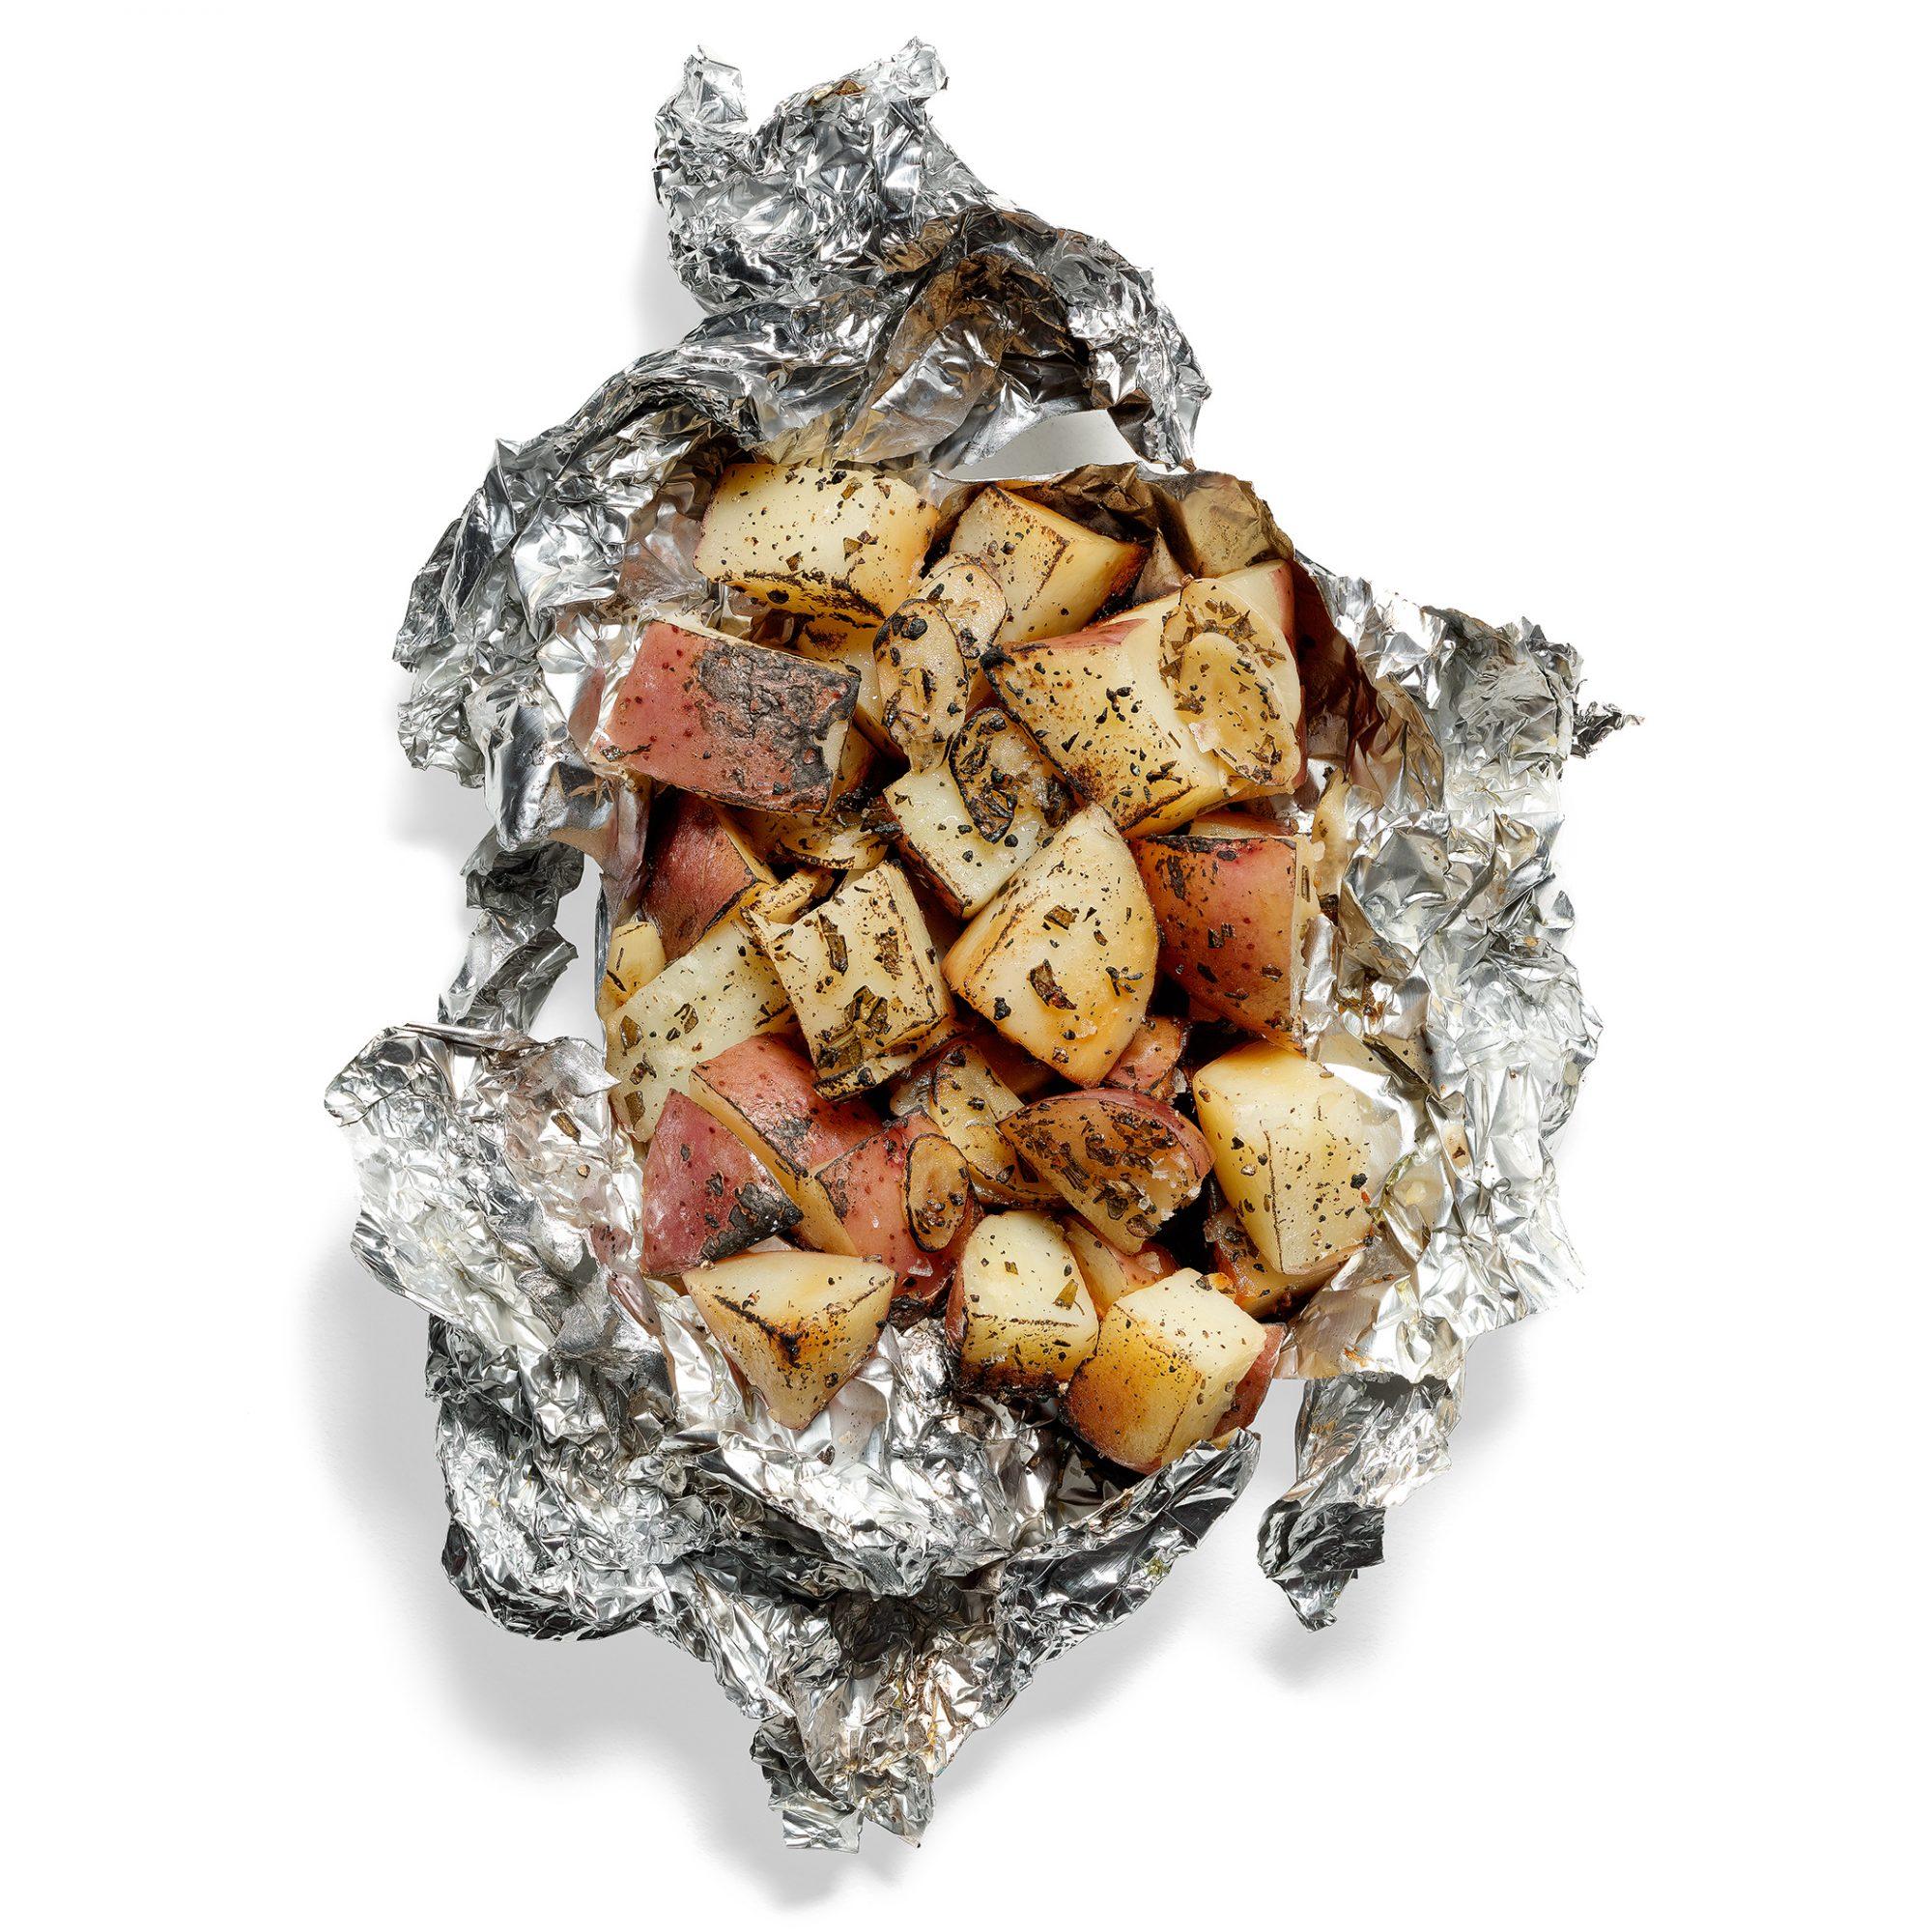 Potato, Garlic and Rosemary Packets